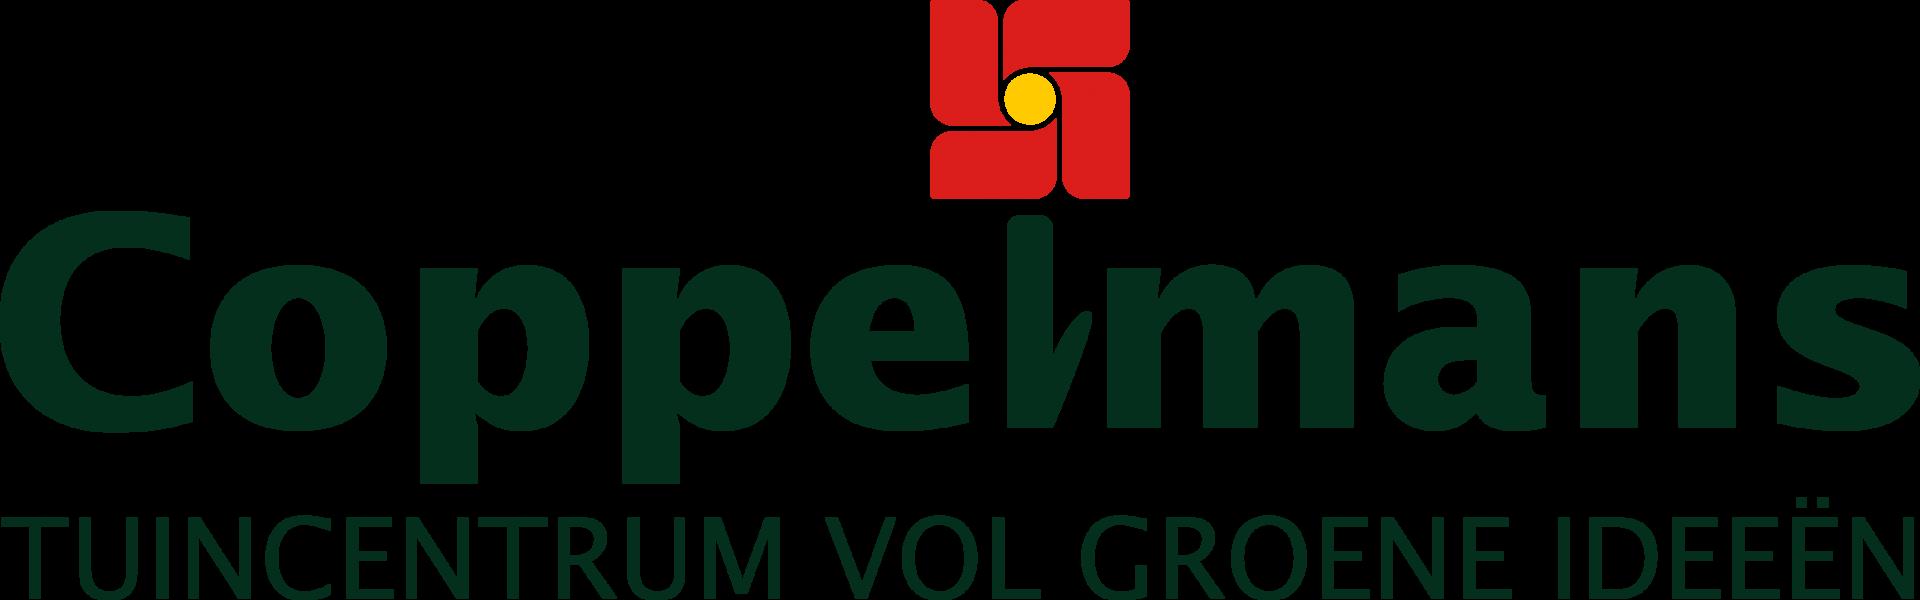 logo_Coppelmans